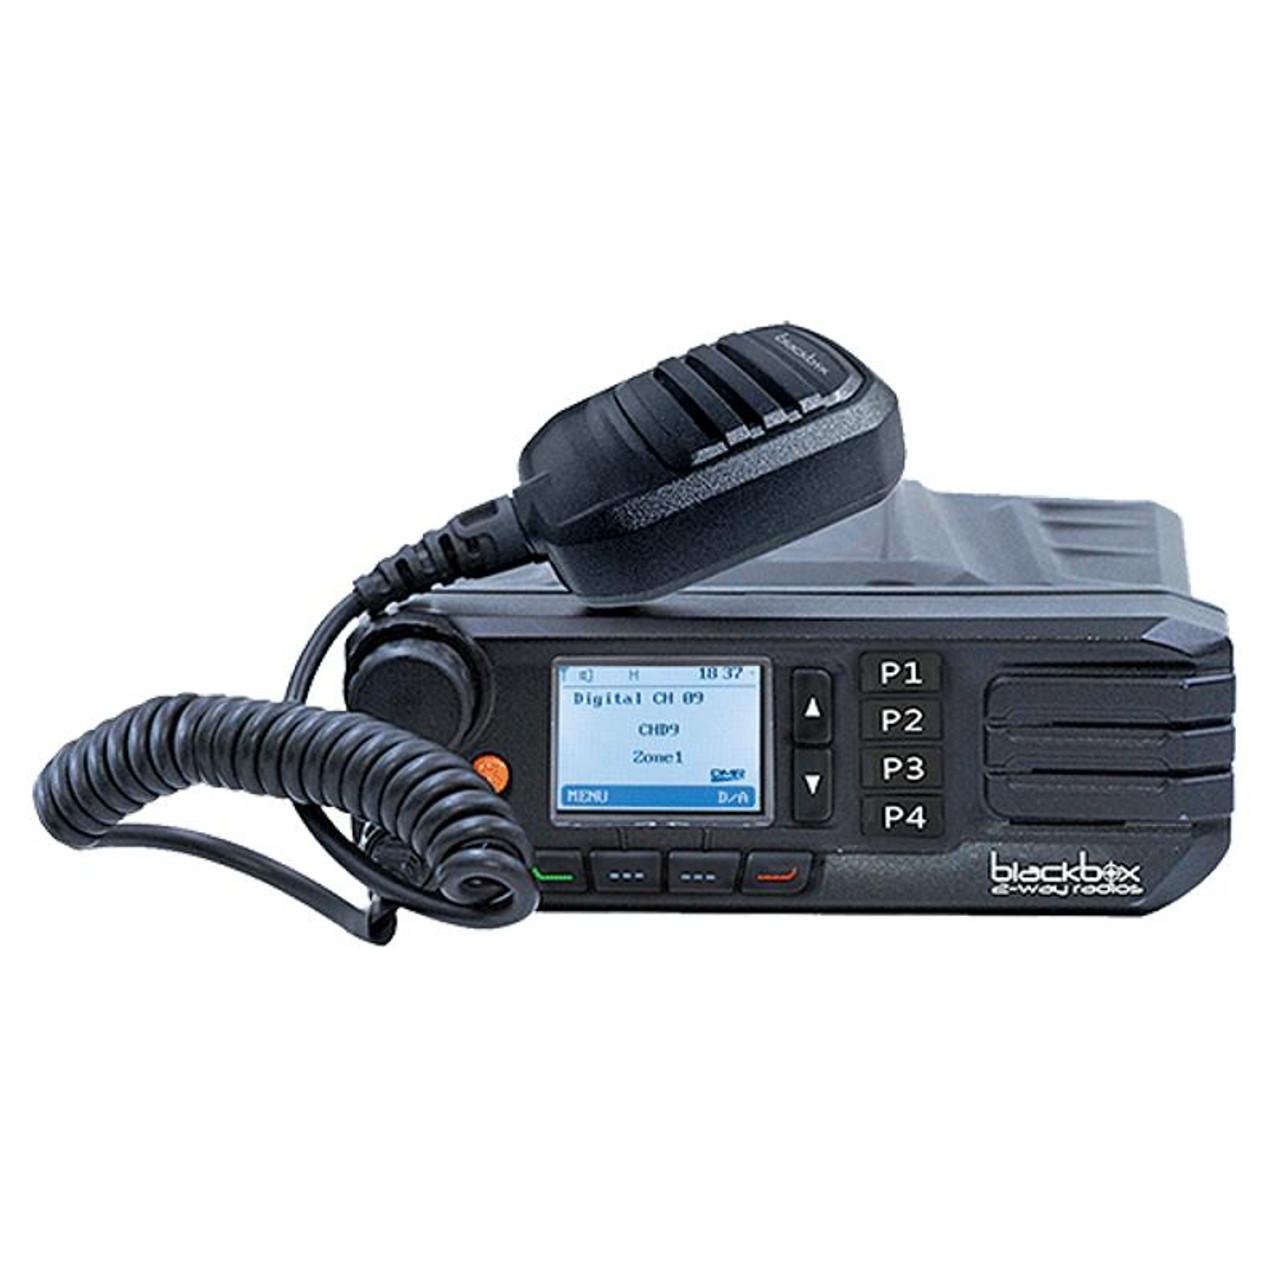 Uitgelezene Blackbox DMR GO Mobile UHF Two Way with 50 Watts and over 1000 LU-42